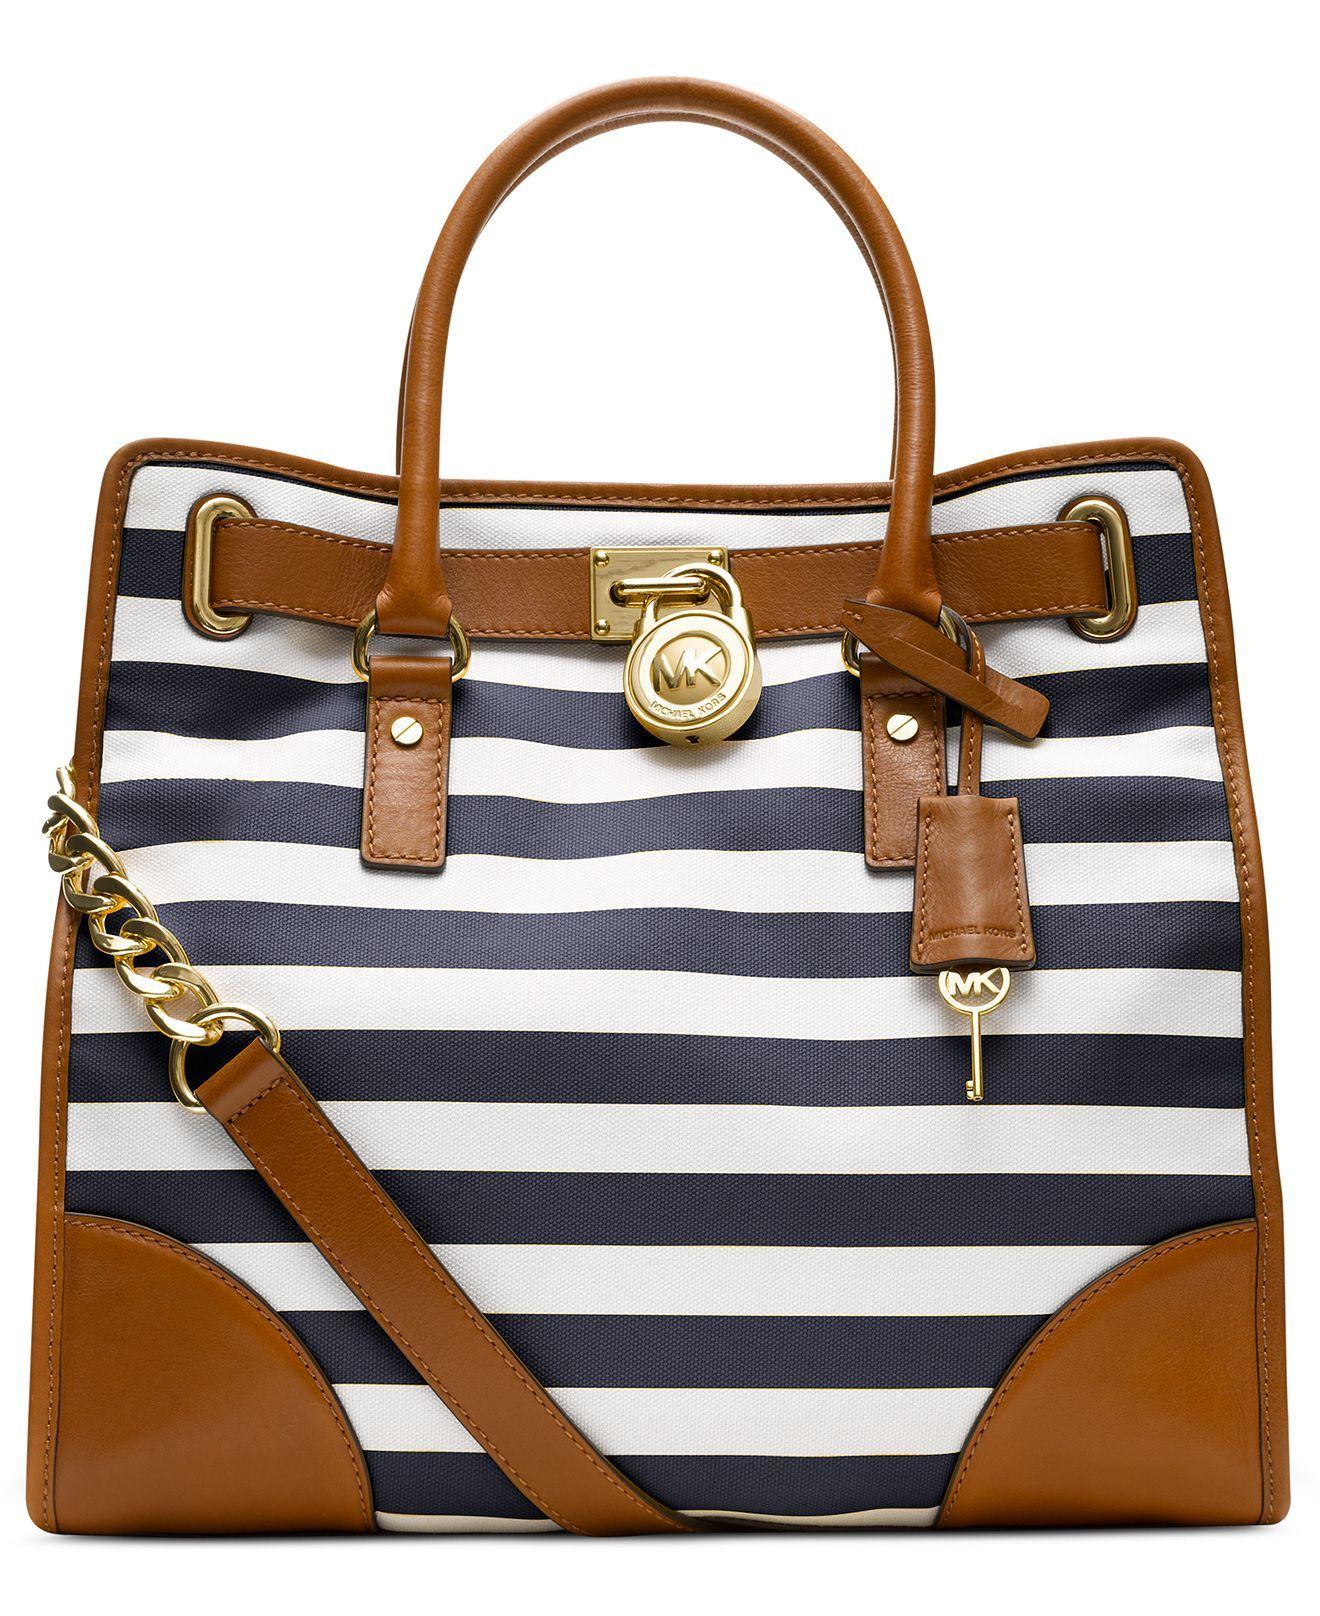 70239c63a357e2 MICHAEL Michael Kors Handbag, Hamilton Large Stripe North South Tote -  Handbags & Accessories - Macy's